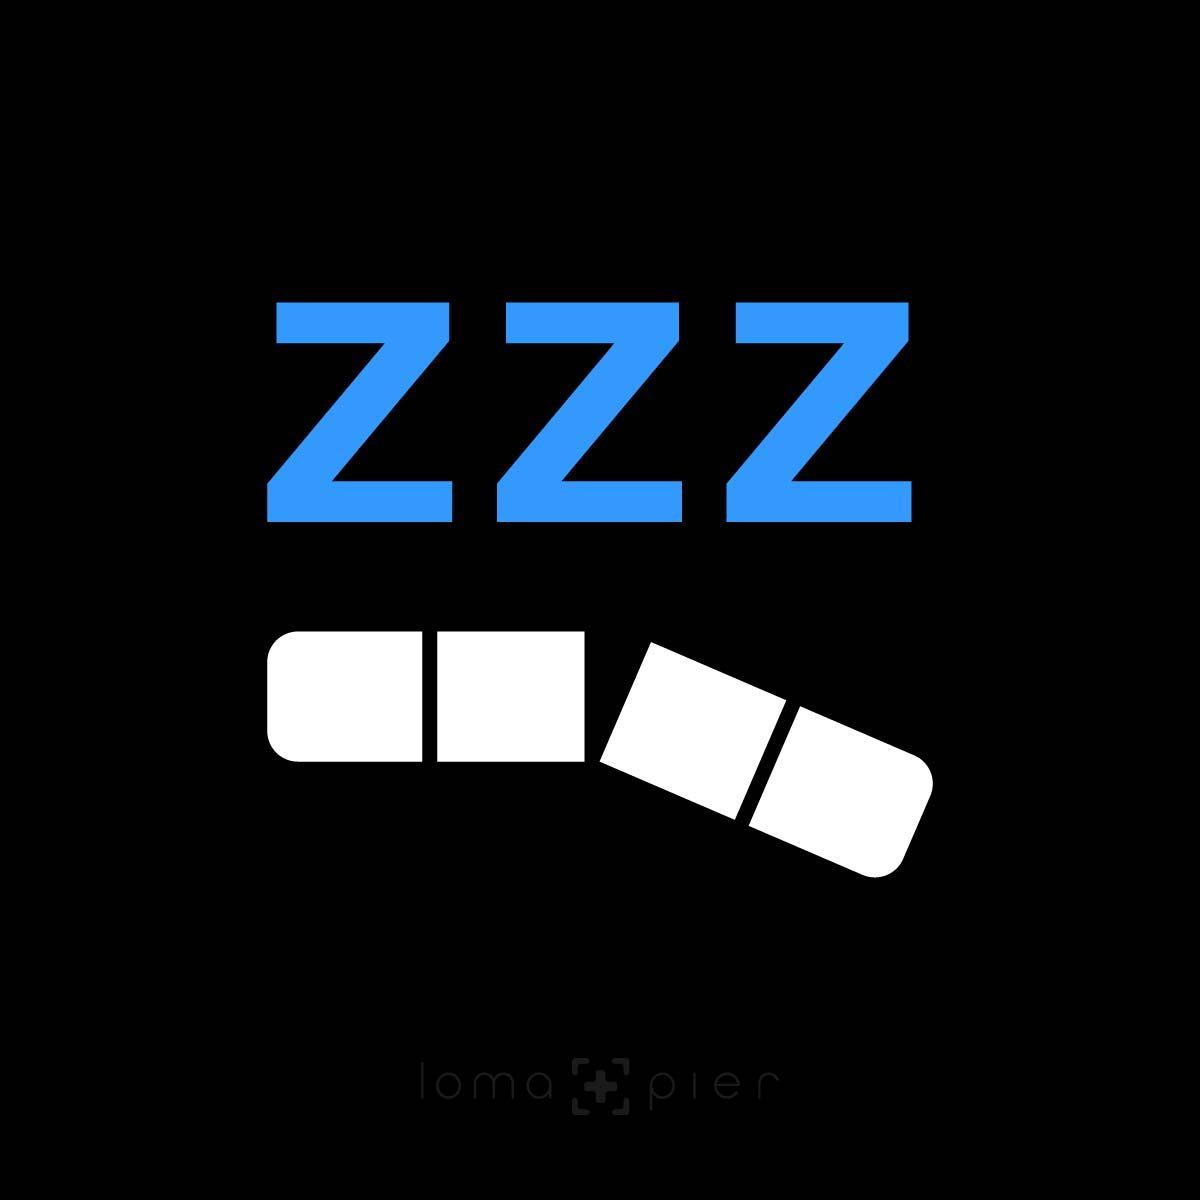 ZZZ-ANNY icon design by loma+pier hat store